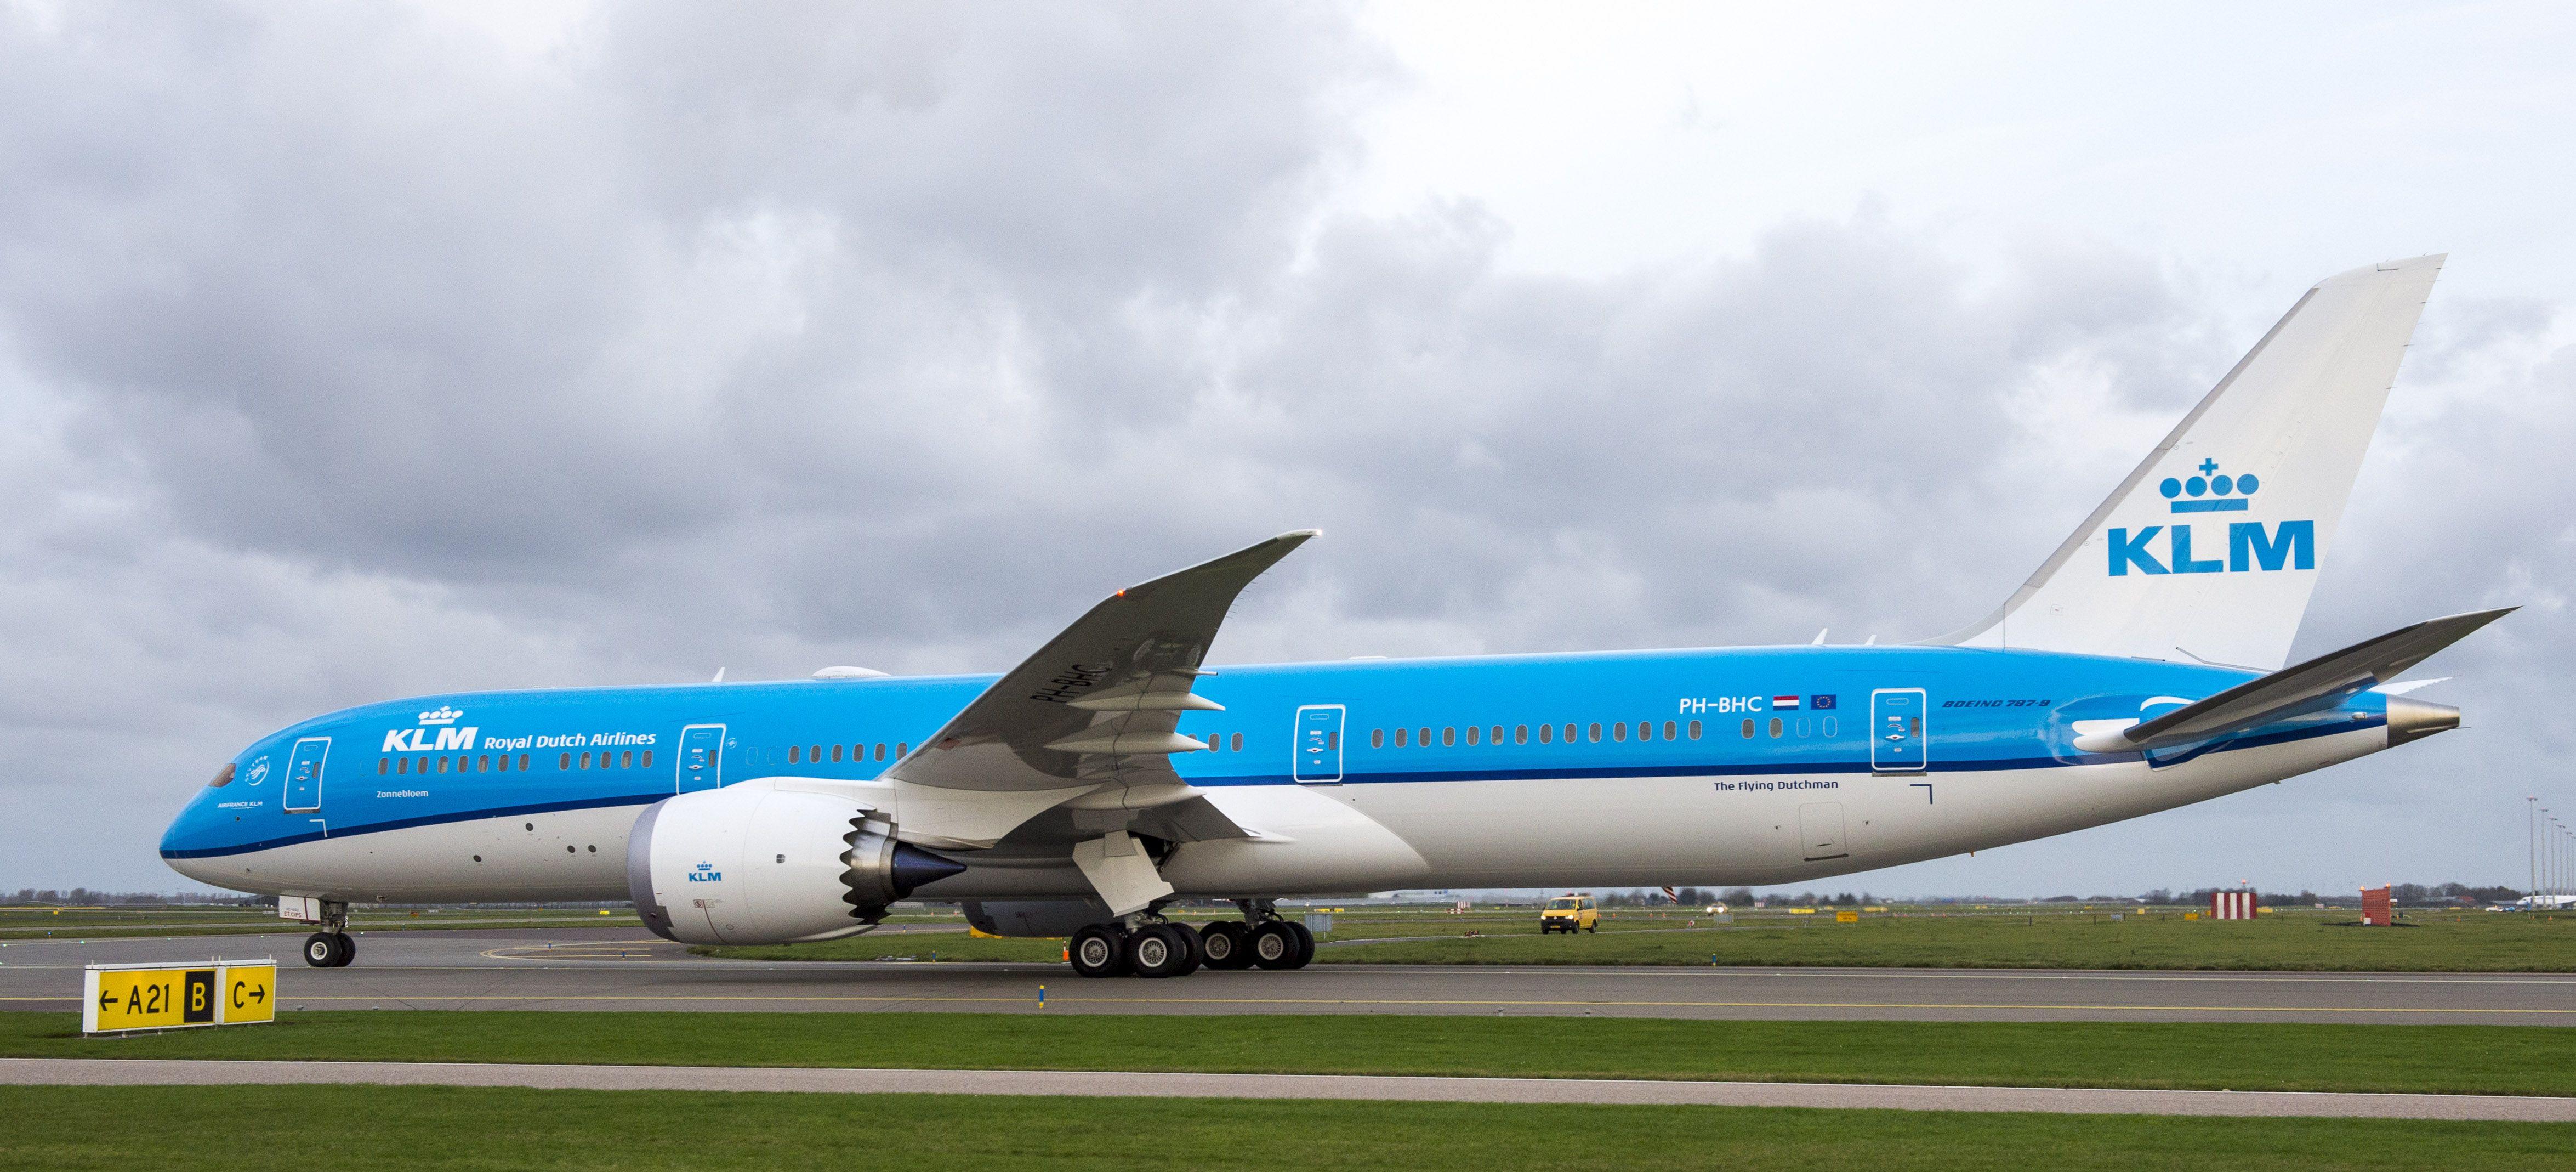 Eerste Boeing 787 Klm Geland Op Schiphol Vliegtuigenspotter Nl Vliegtuig